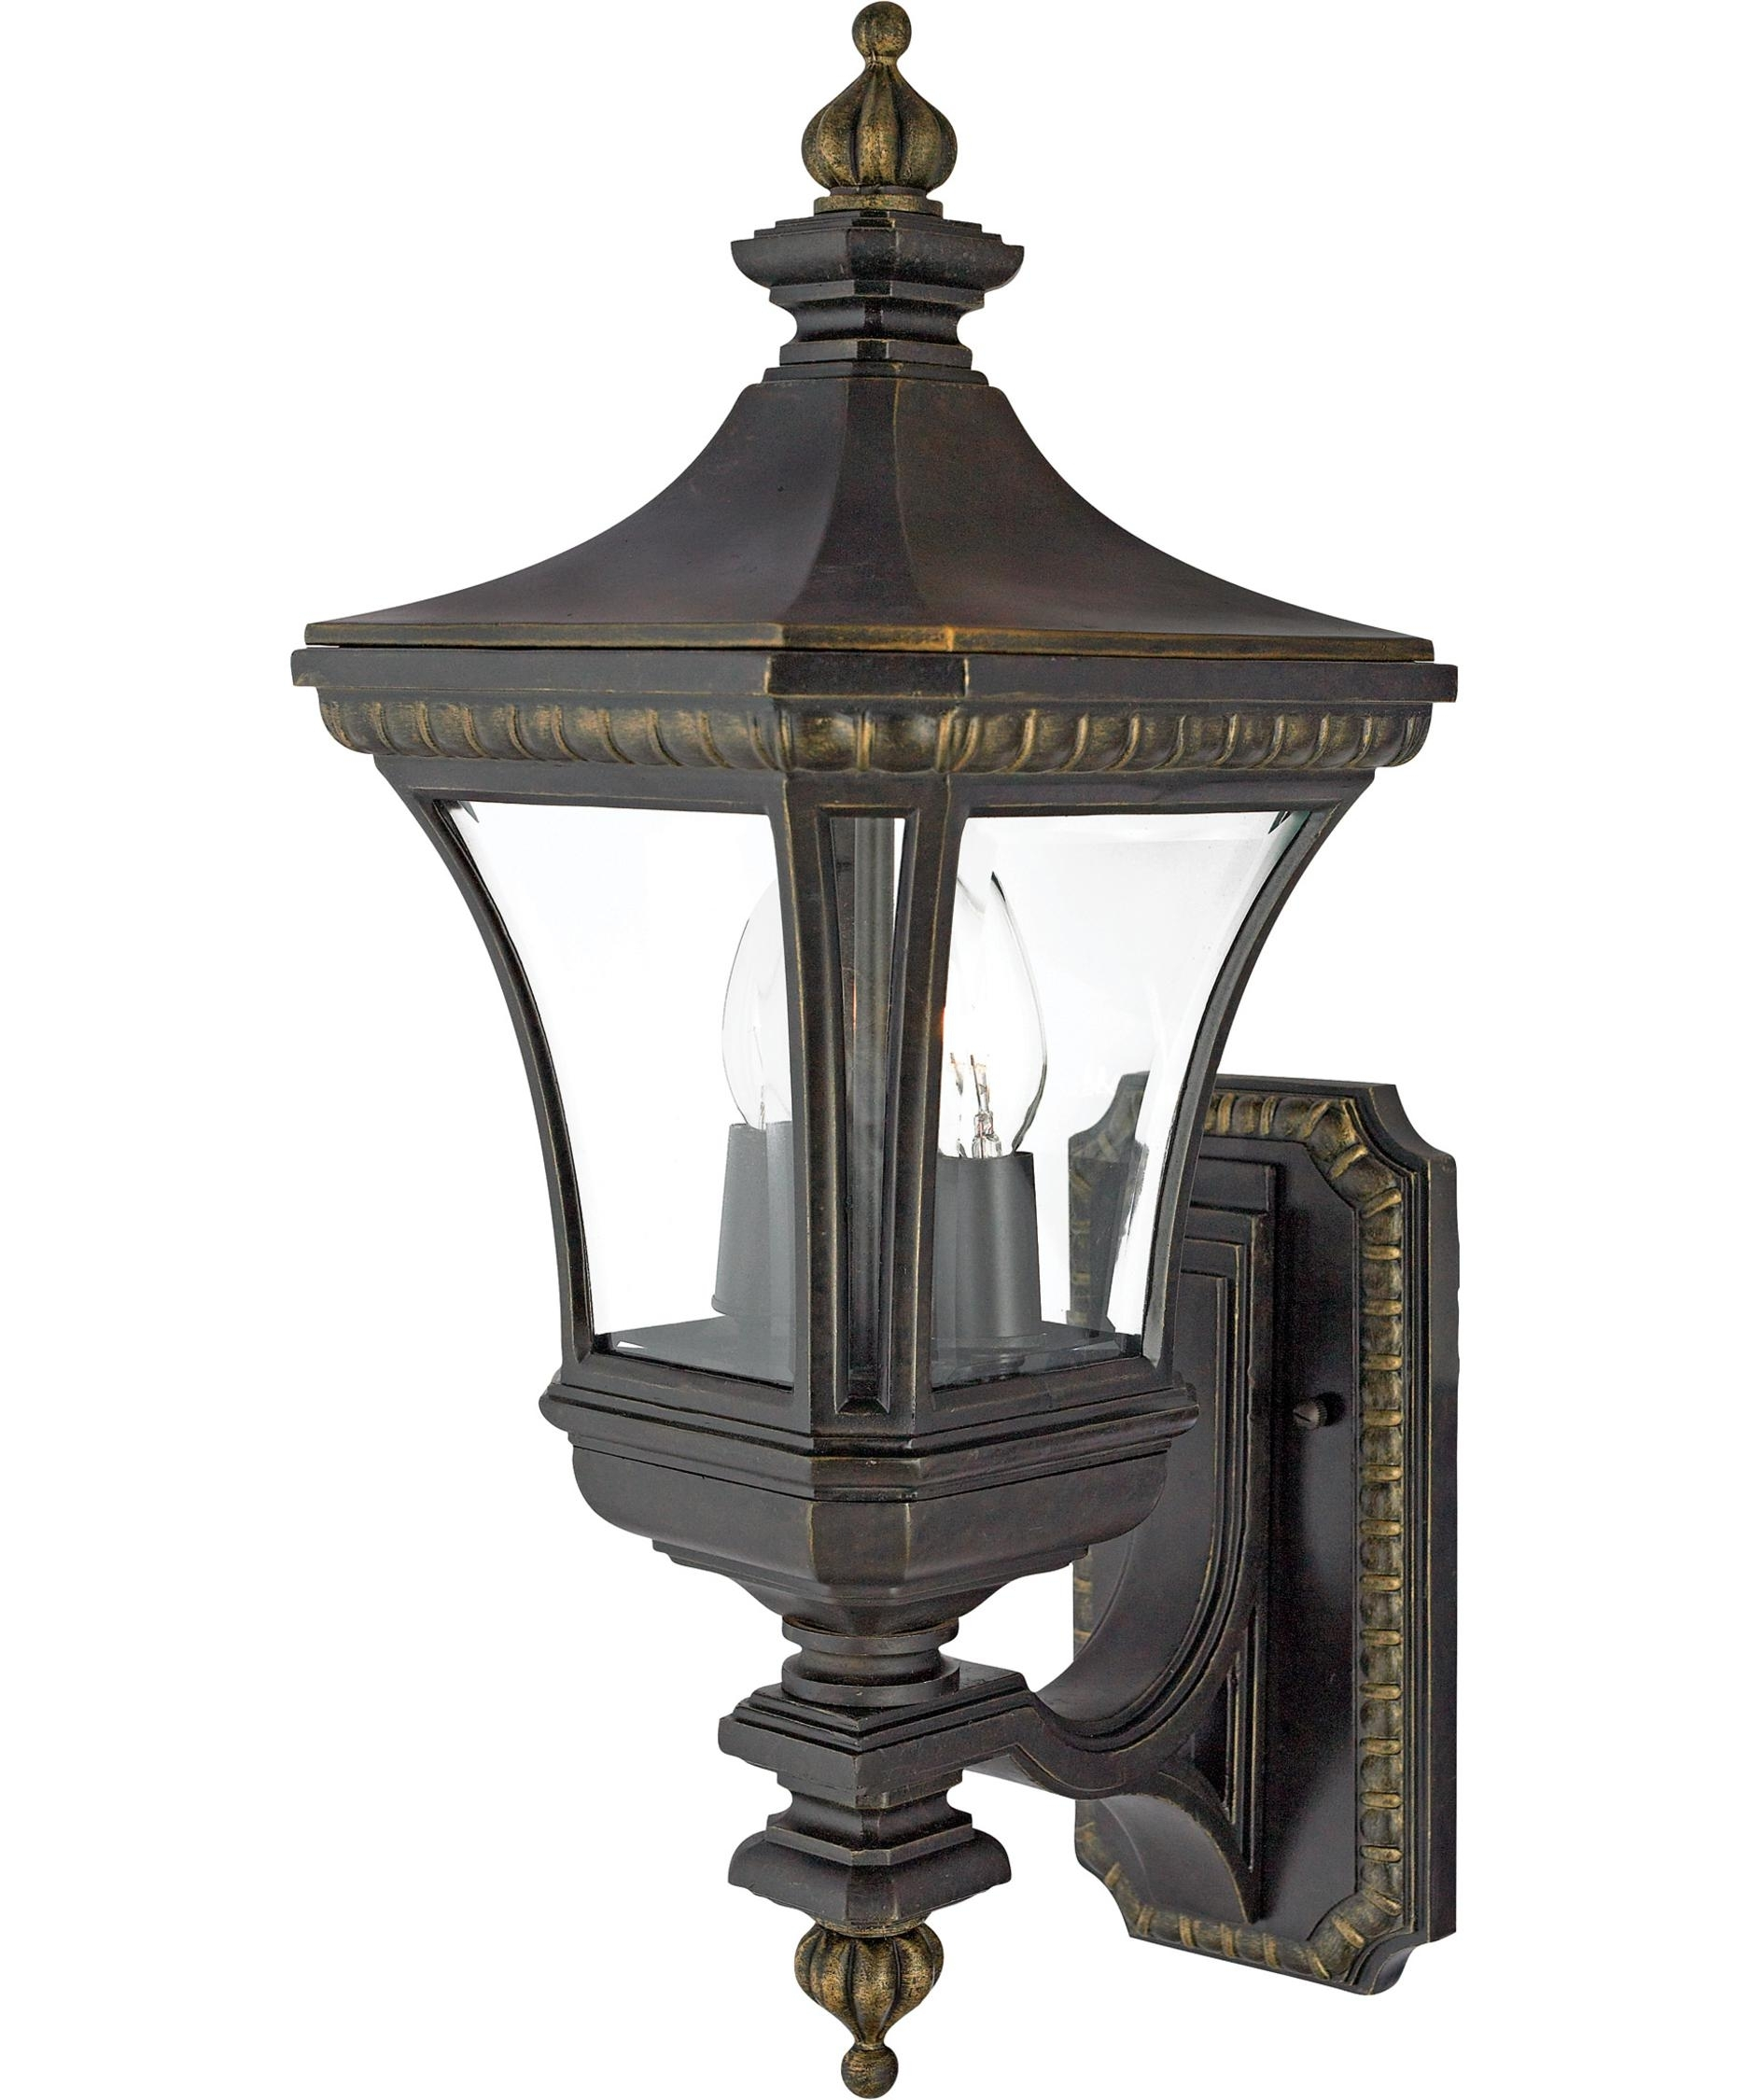 1940s Porch Light Victorian Lamp Post Antique Lights 1920s Outdoor Regarding Victorian Outdoor Lanterns (View 17 of 20)